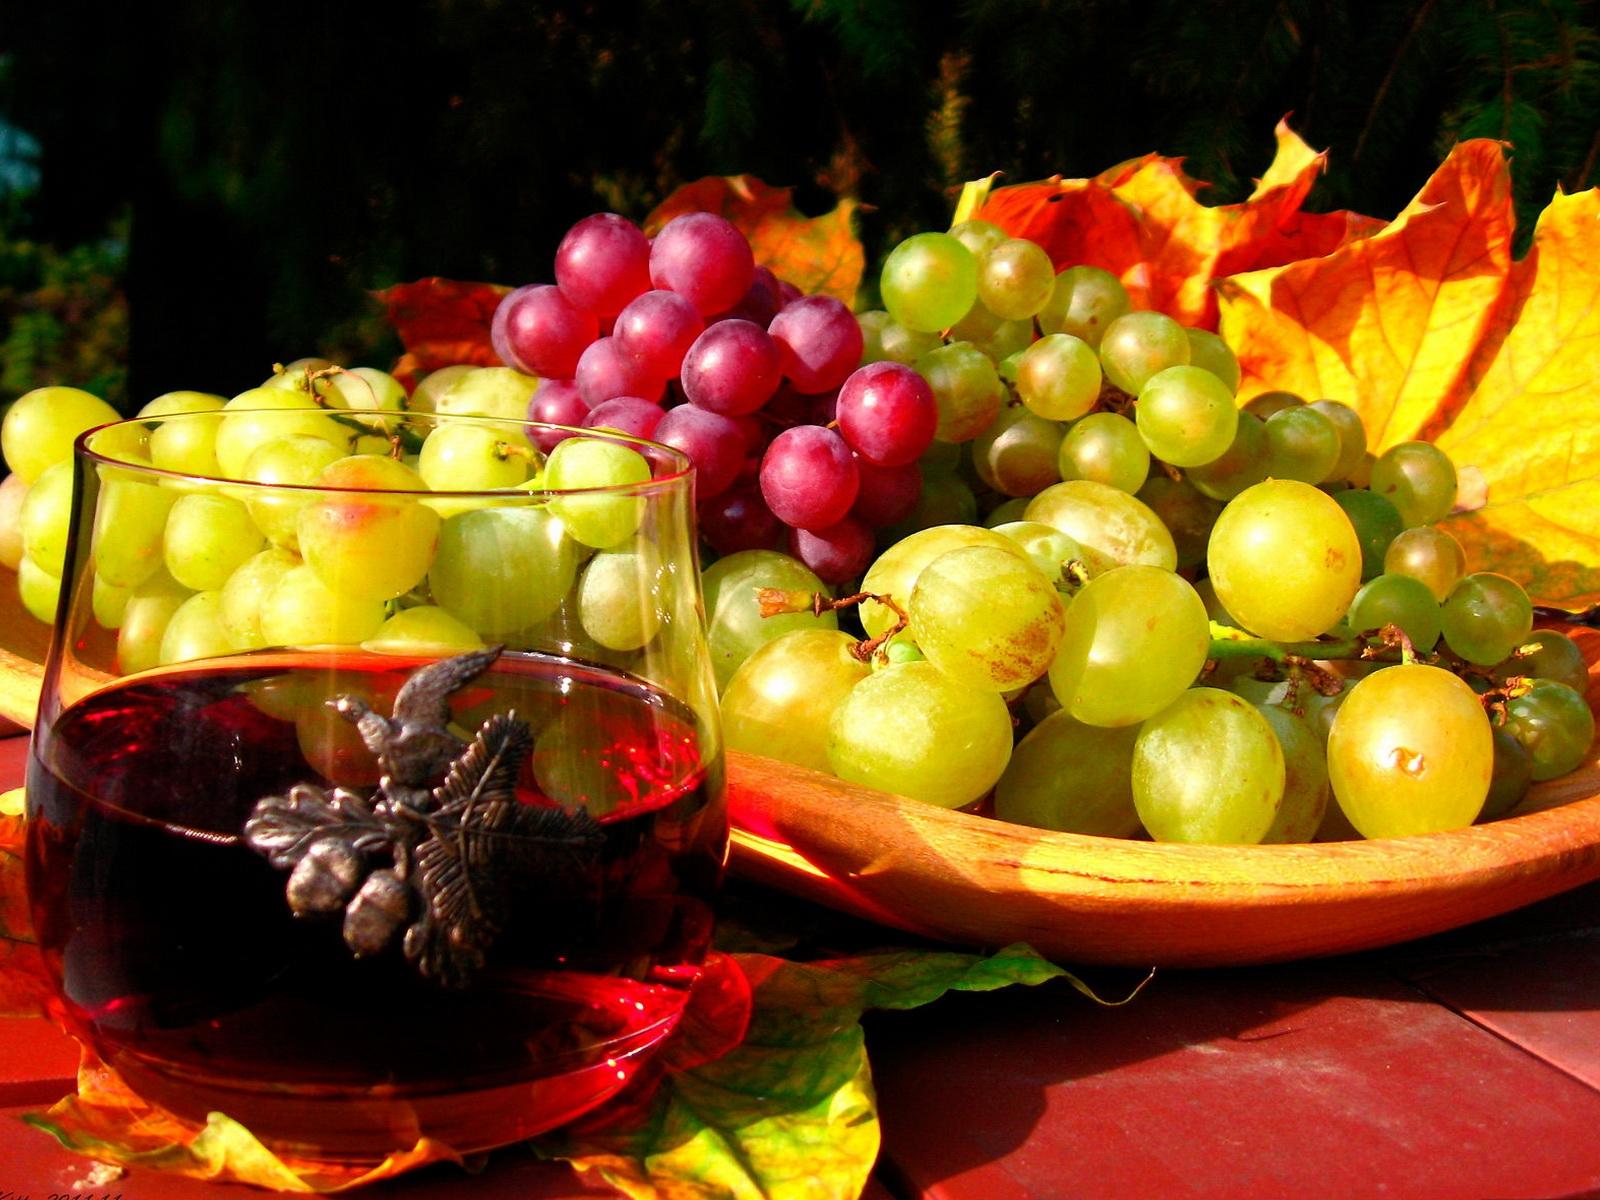 grapes_fruit_plate_grades_autumn_leaves_wine_5861_1600x1200